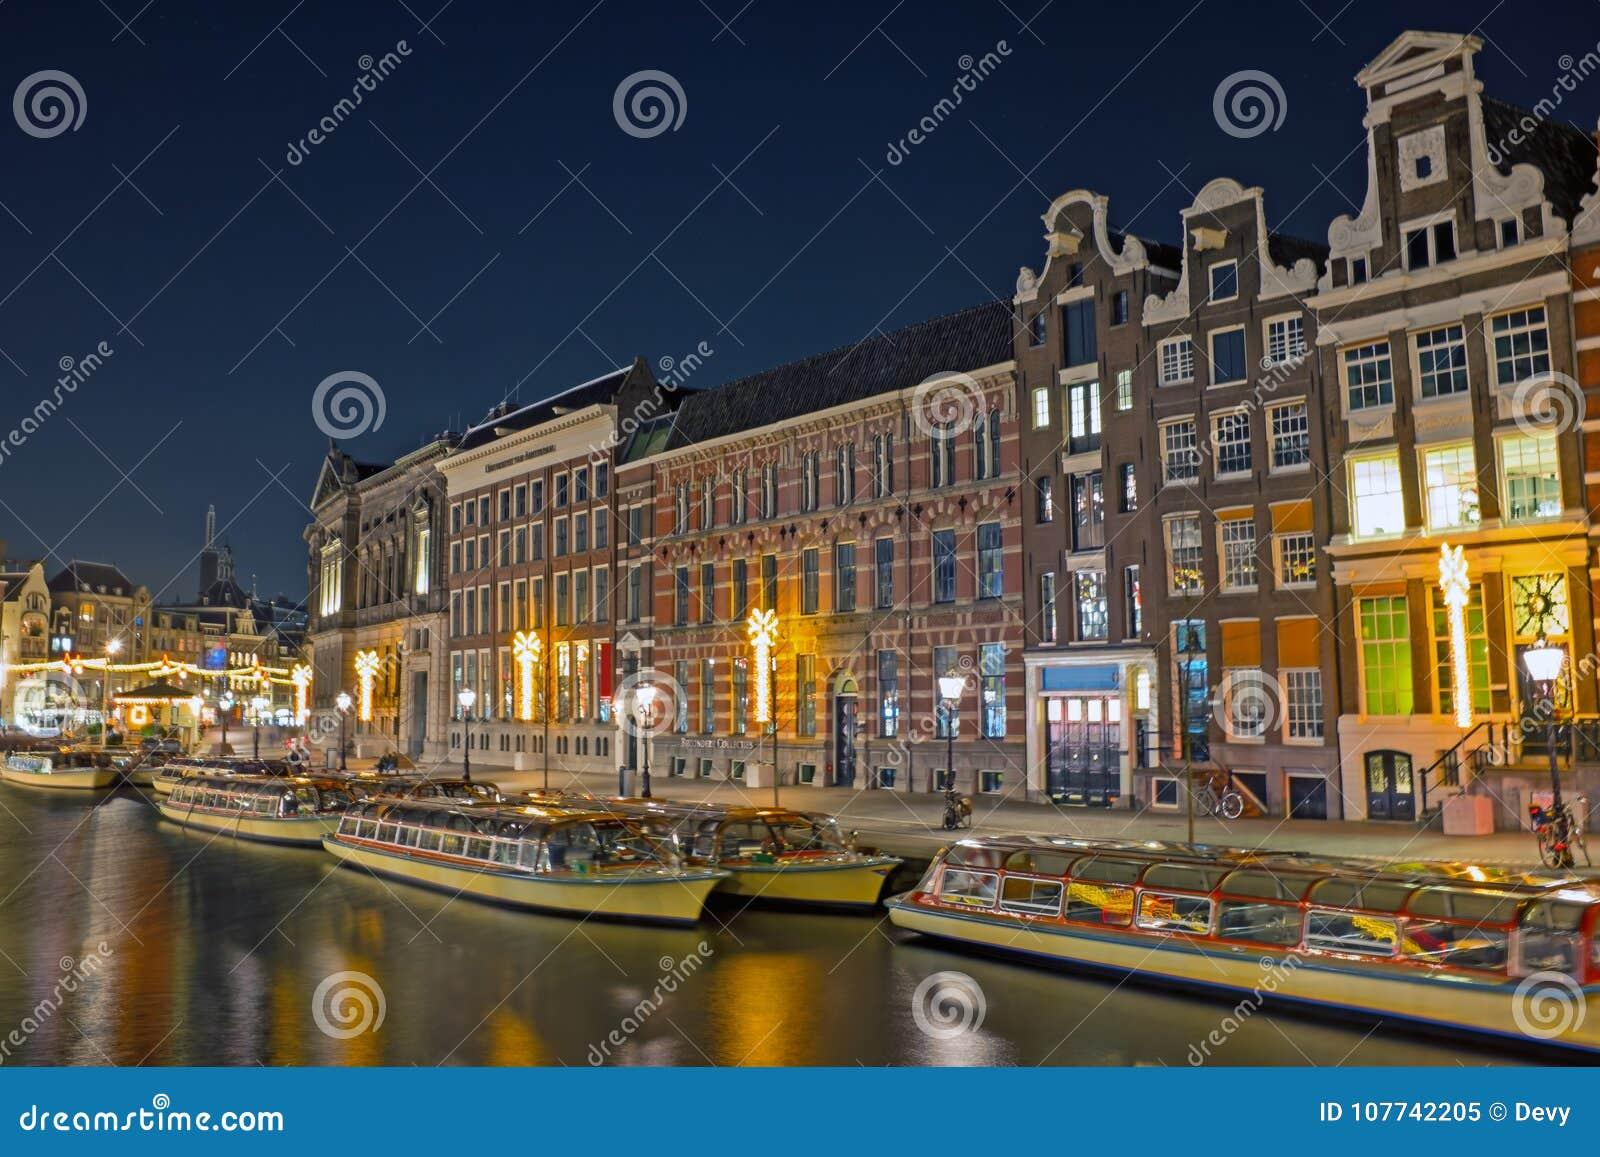 Foto Di Amsterdam A Natale.Citta Scenica Da Amsterdam A Natale Nei Paesi Bassi A Ni